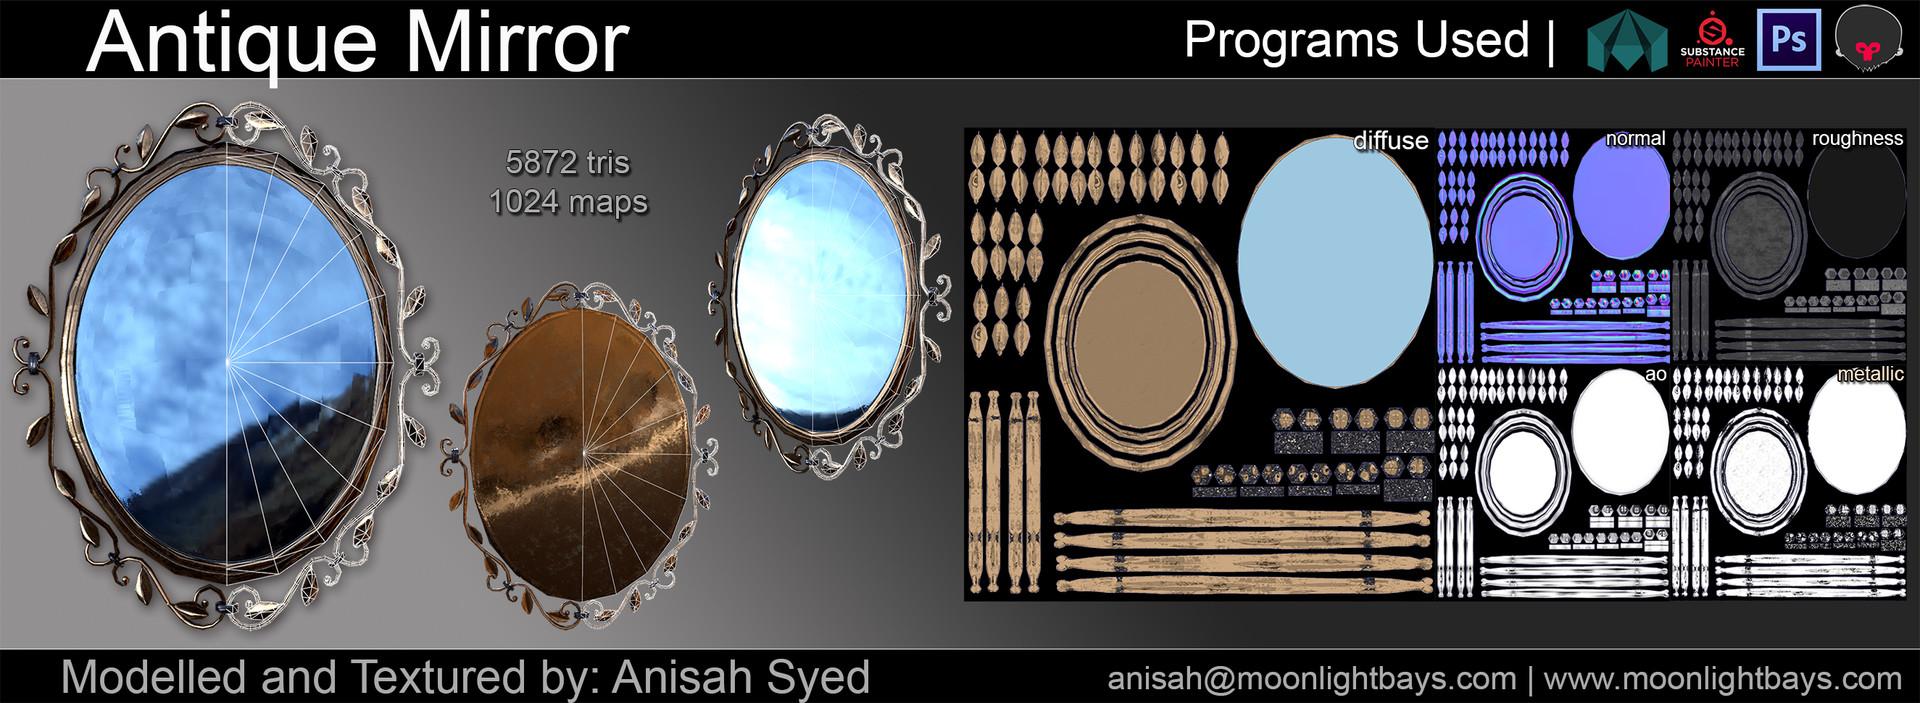 Anisah syed antiquemirrorpresentation